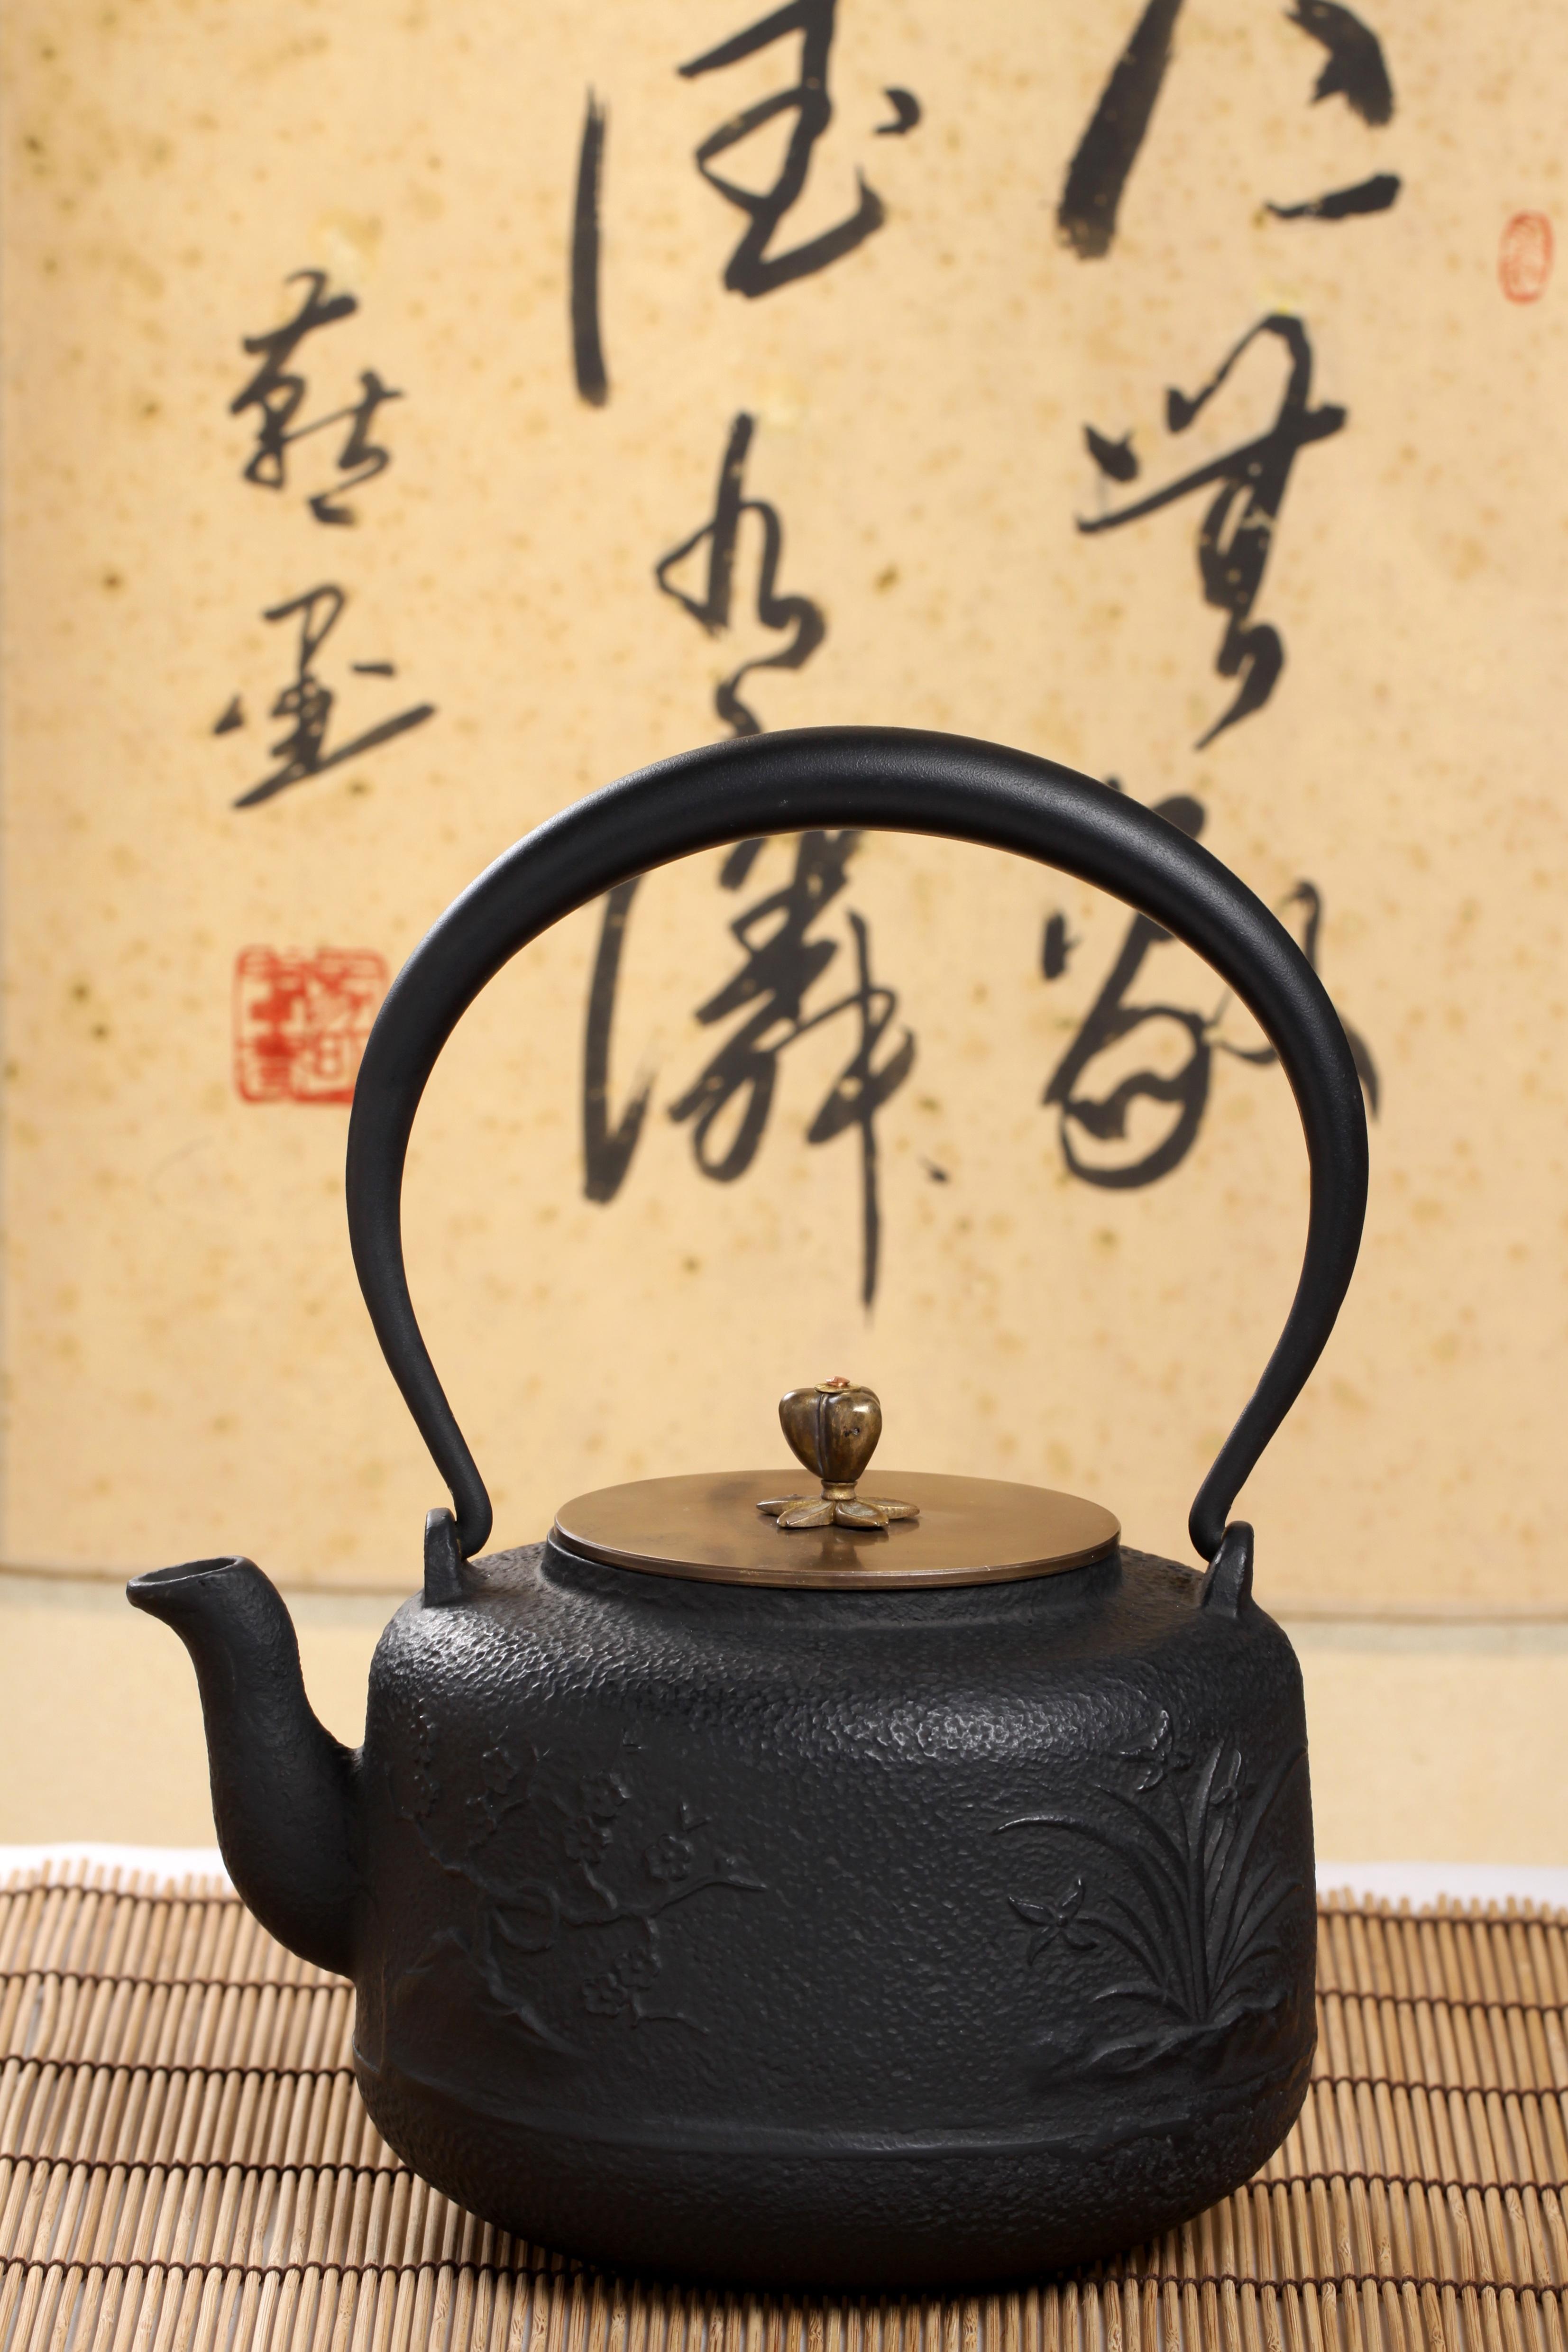 Free Images : tea, teapot, ceramic, art, iron, calligraphy 3307x4961 ...